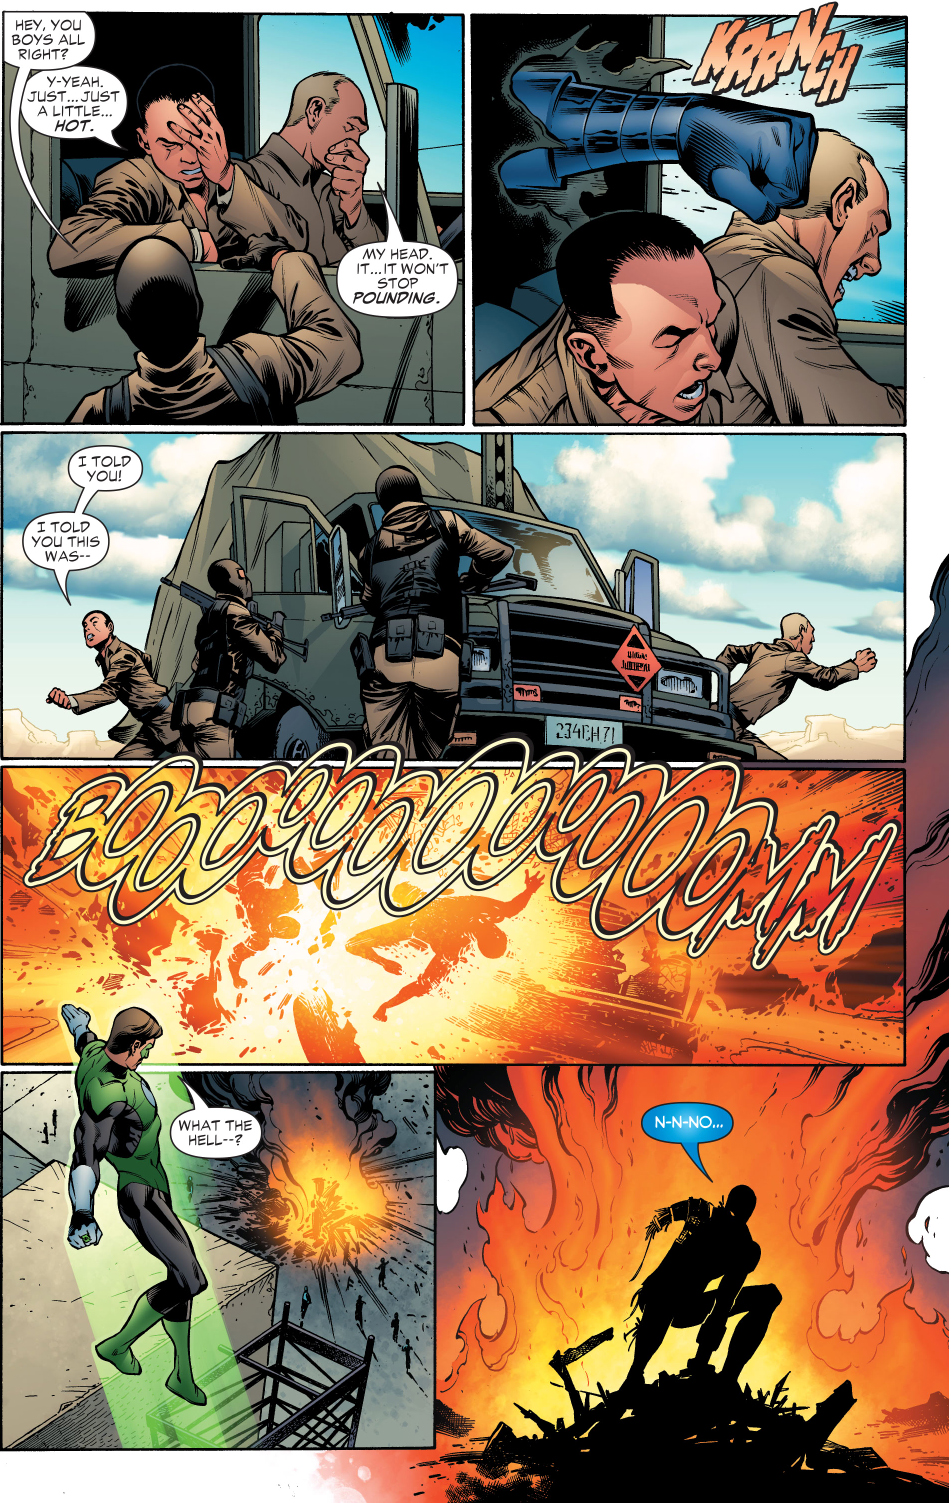 Manhunter (green lantern vol. 4 #2)